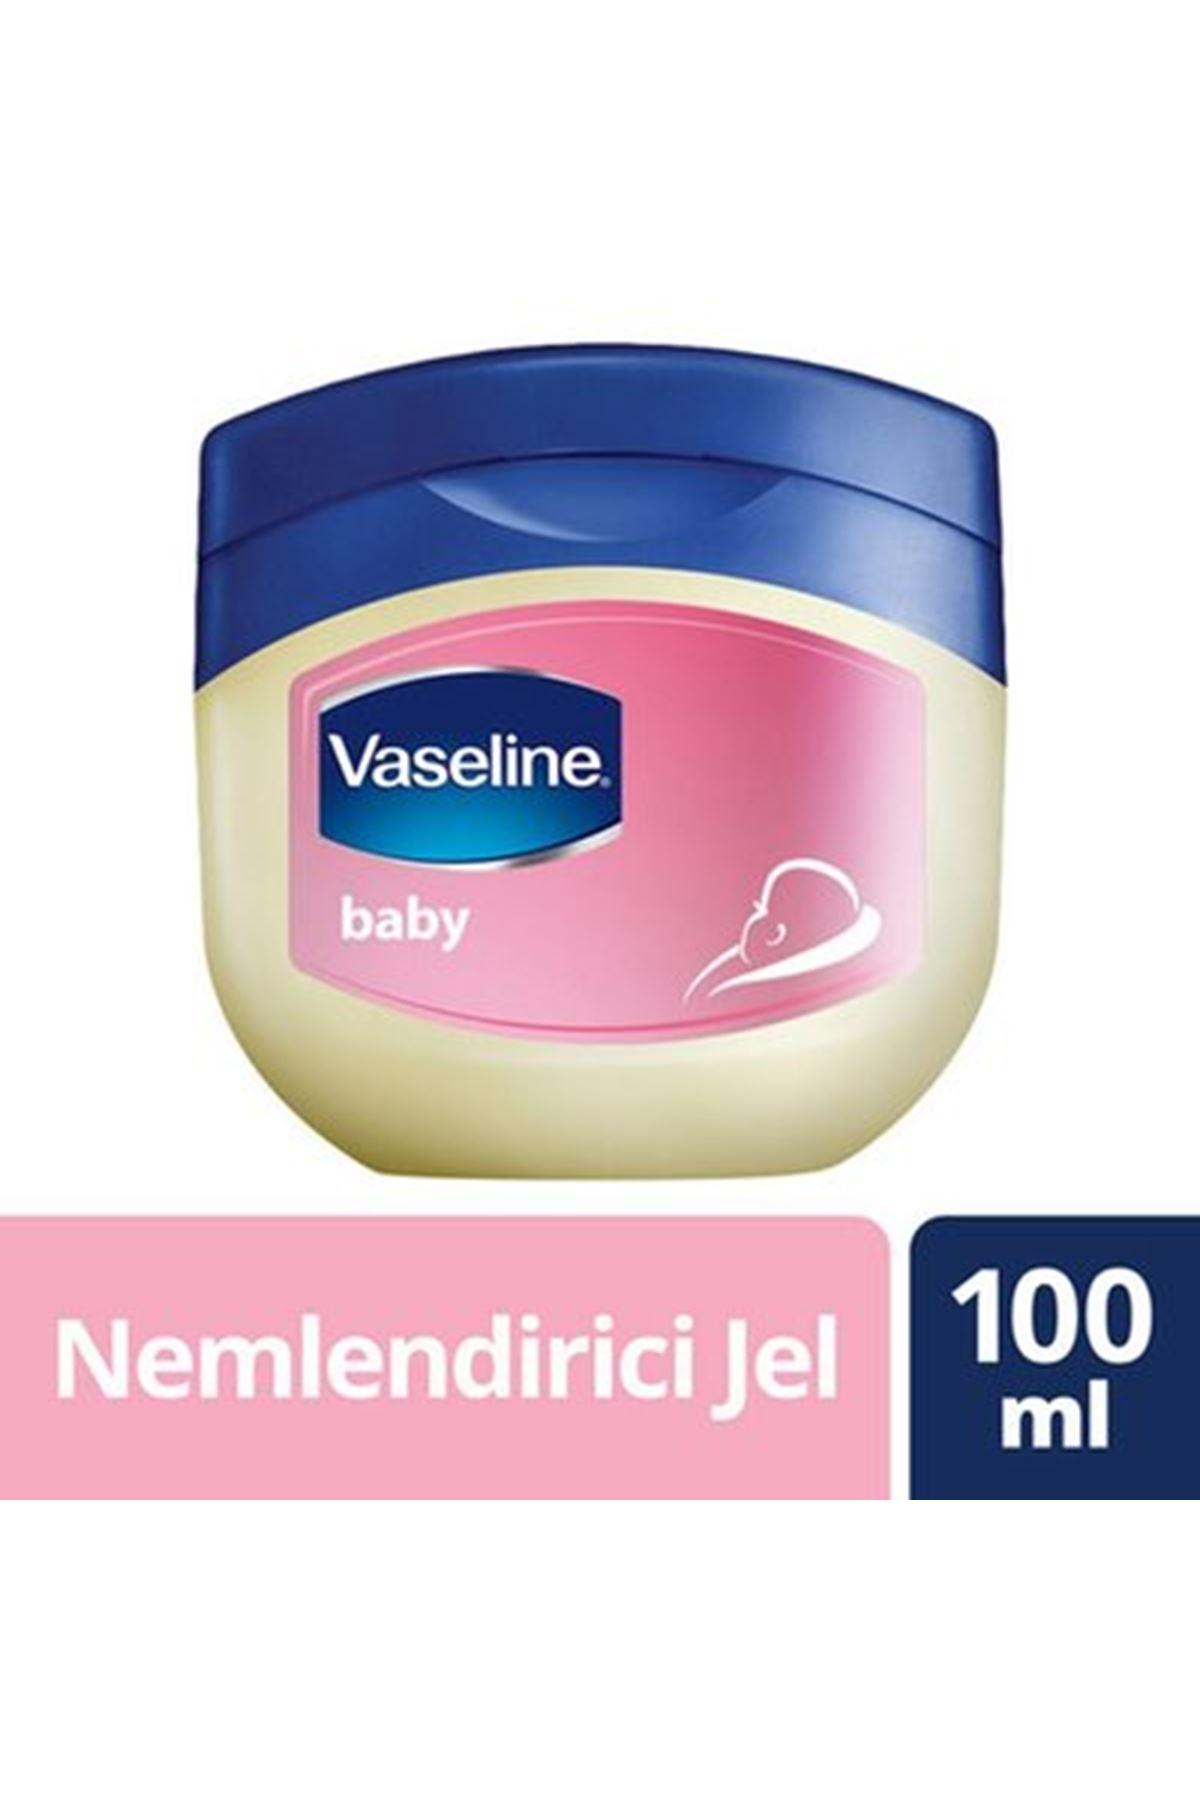 Vaseline Pj Baby 100Ml